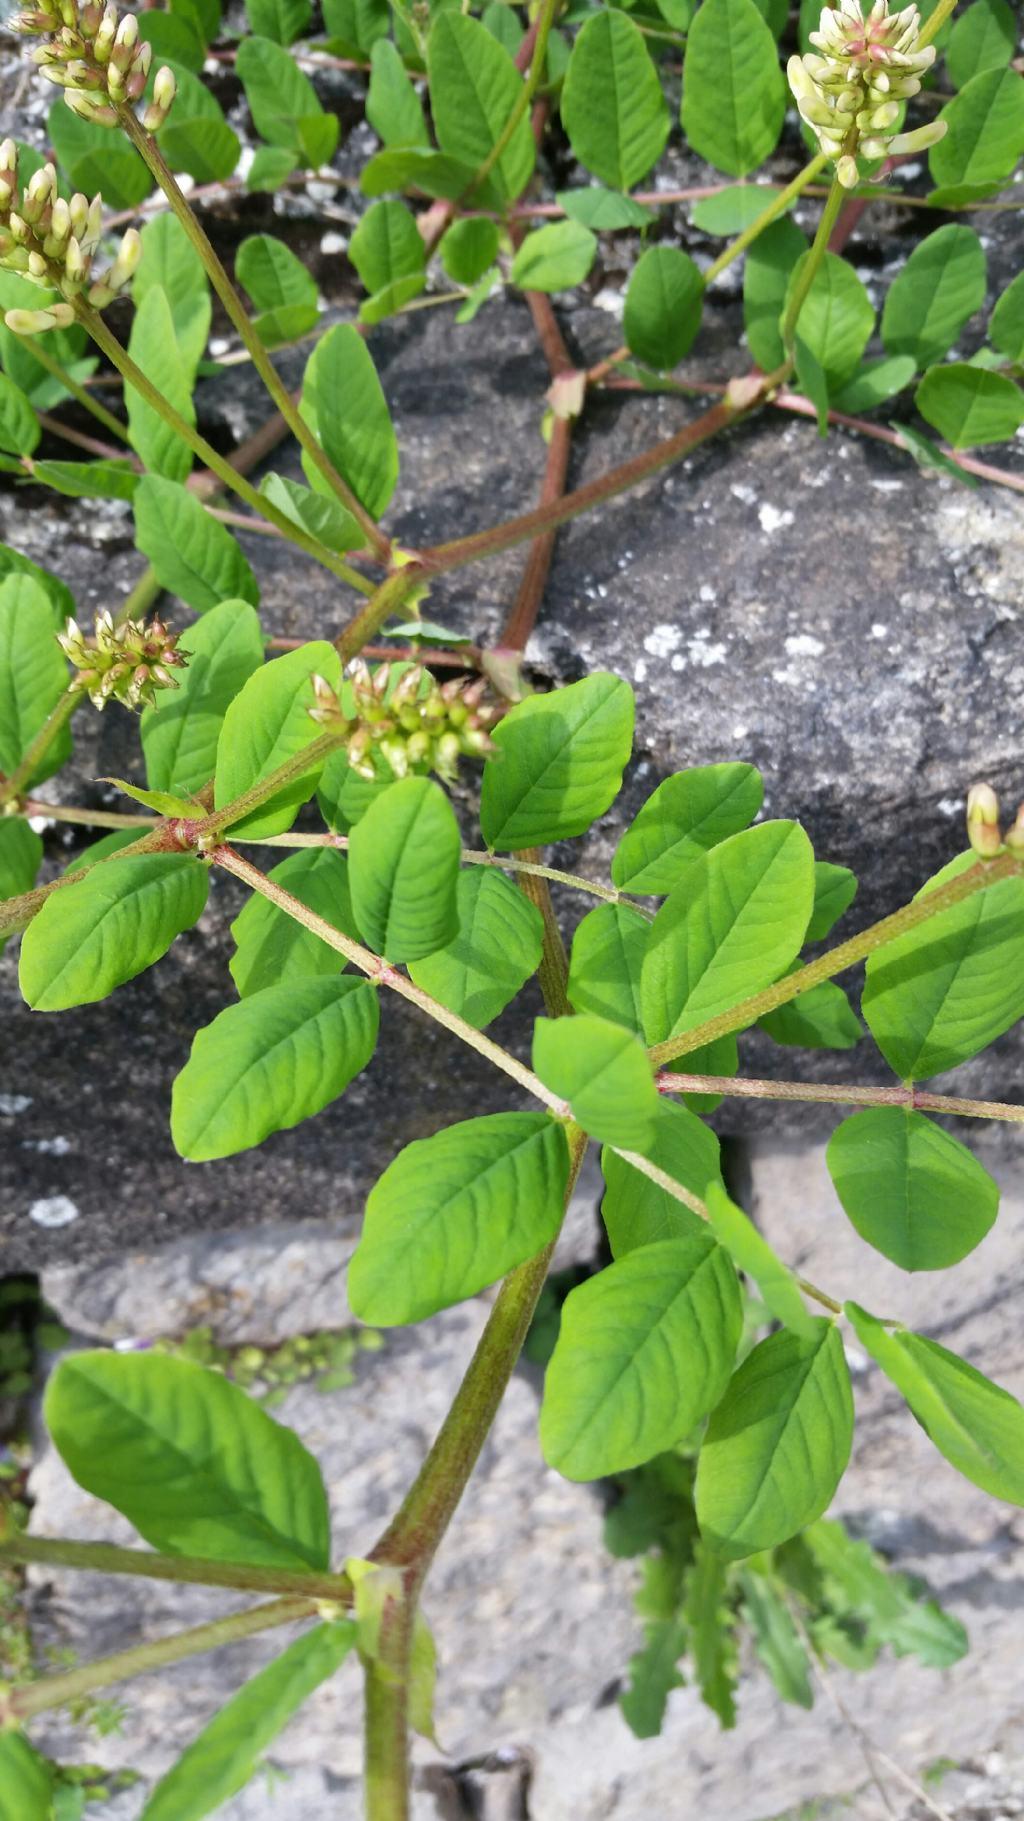 Astragalus glycyphyllos (Fabaceae)